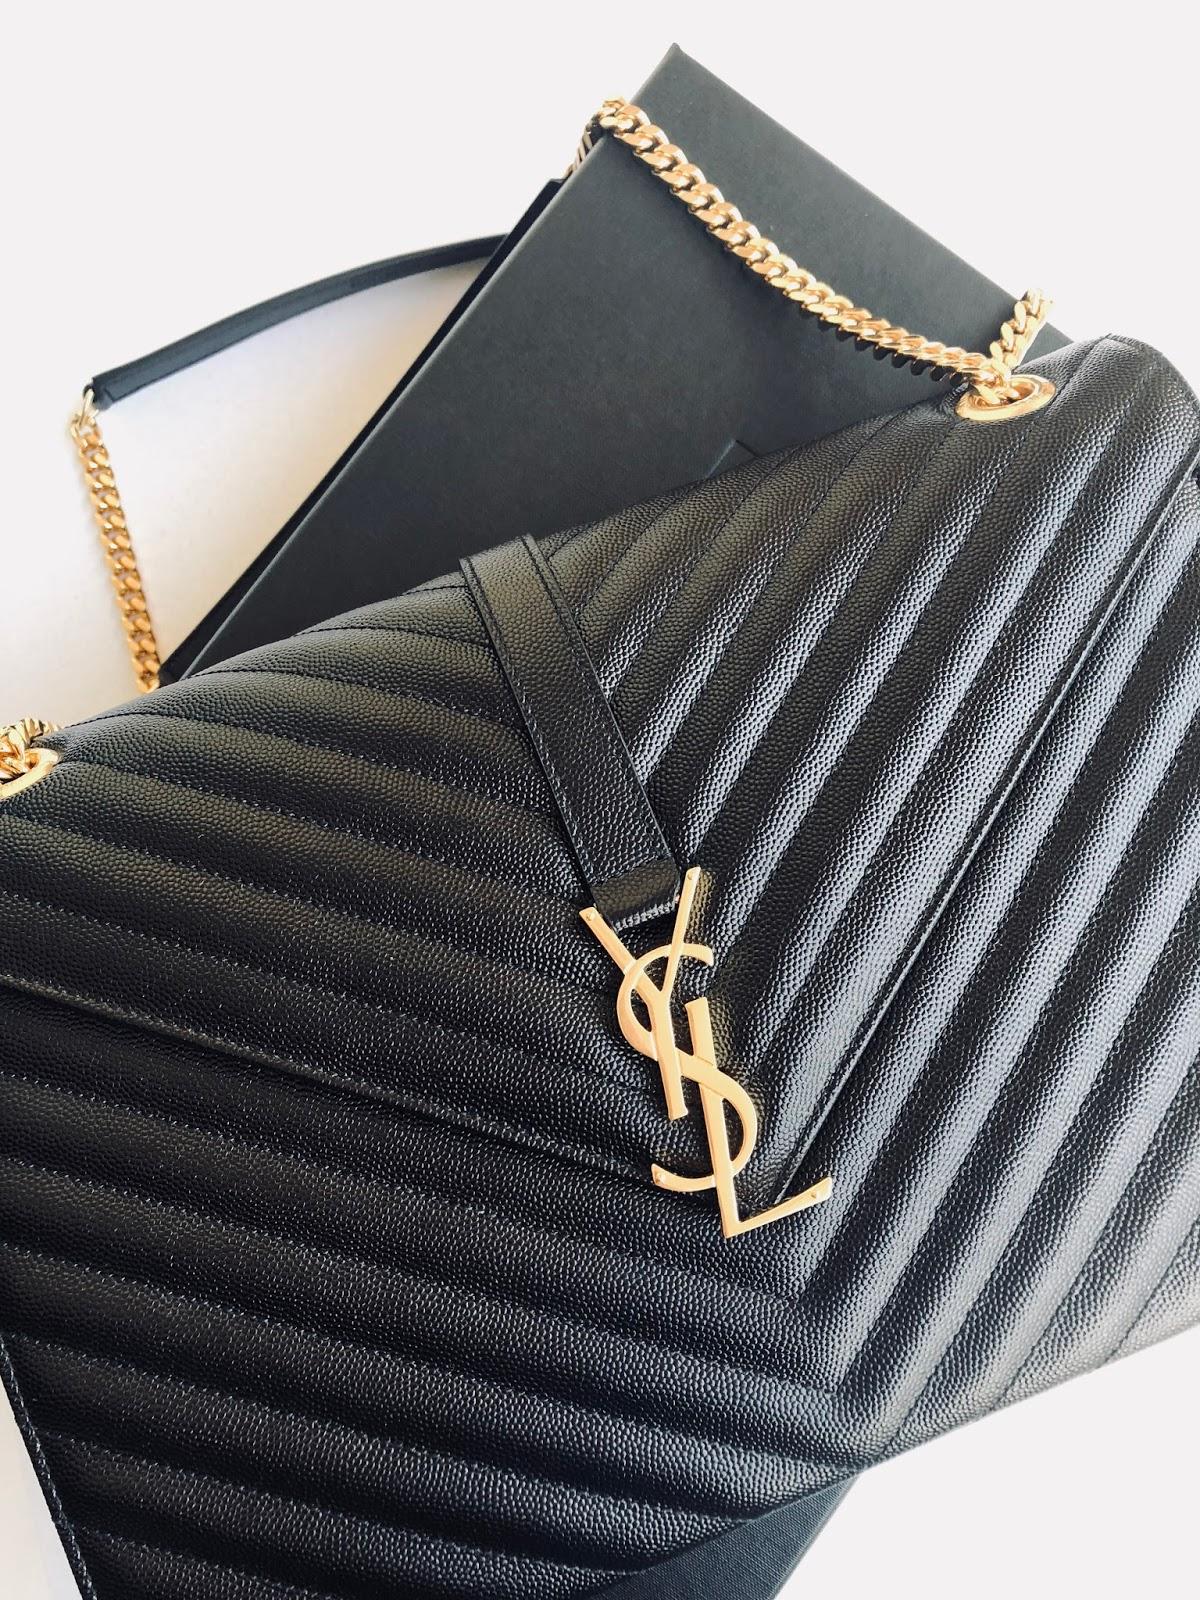 www.ourdubailife.com - Unboxing Day : What I Got For XMAS 2017 YSL Matelasse handbag